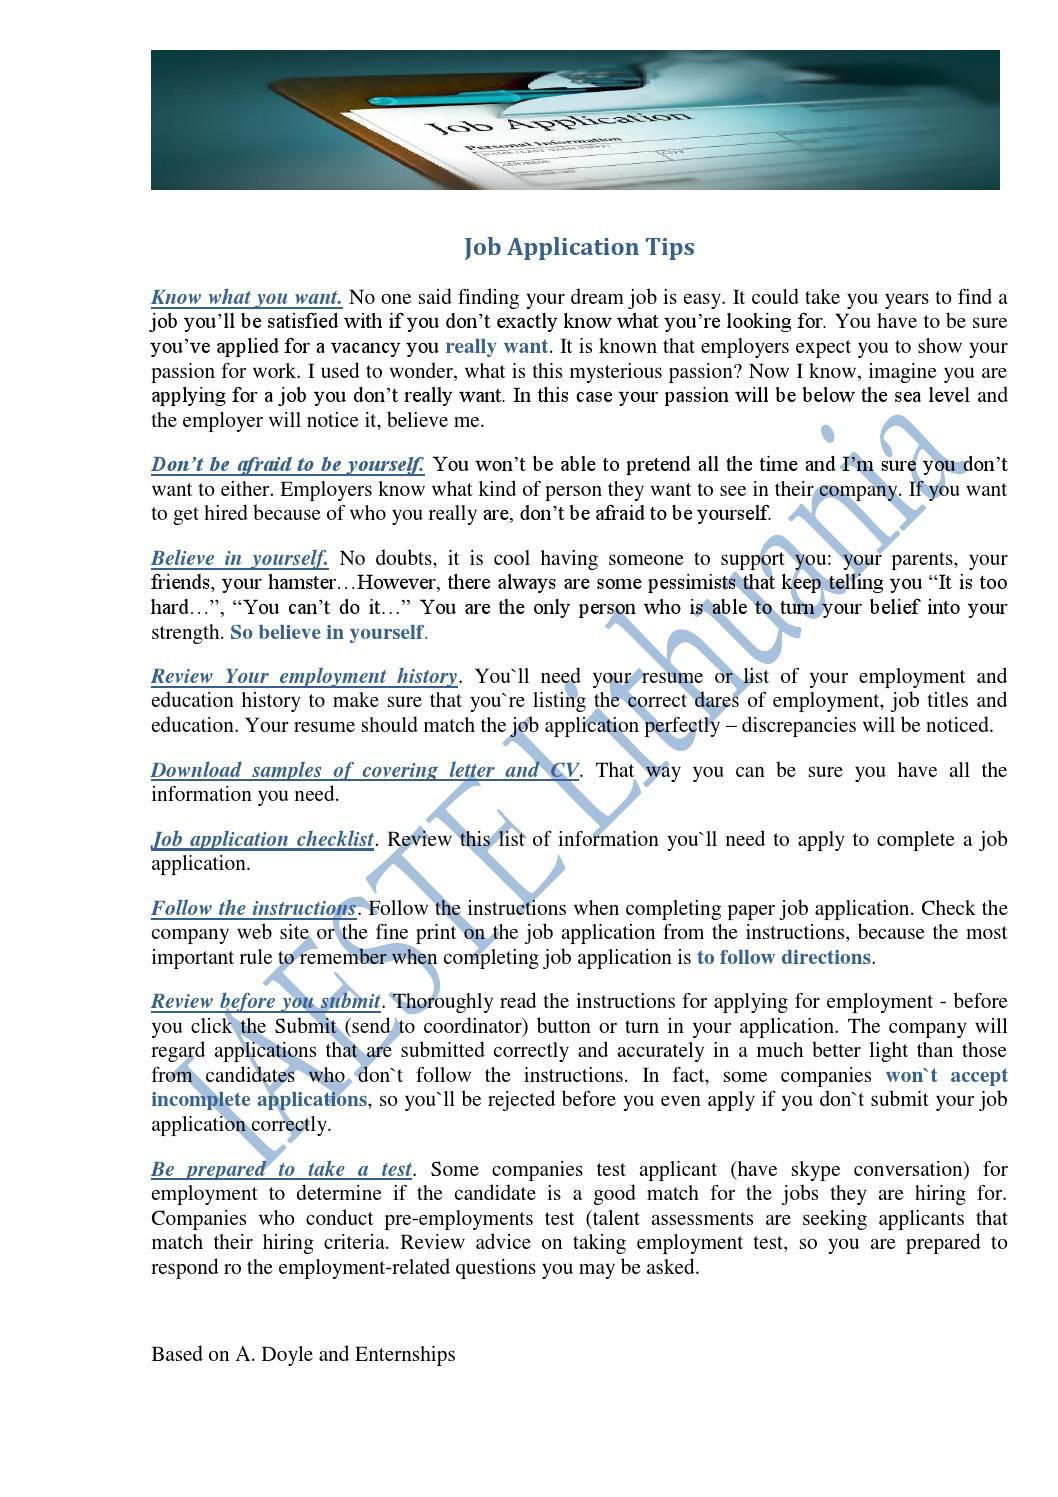 job application match